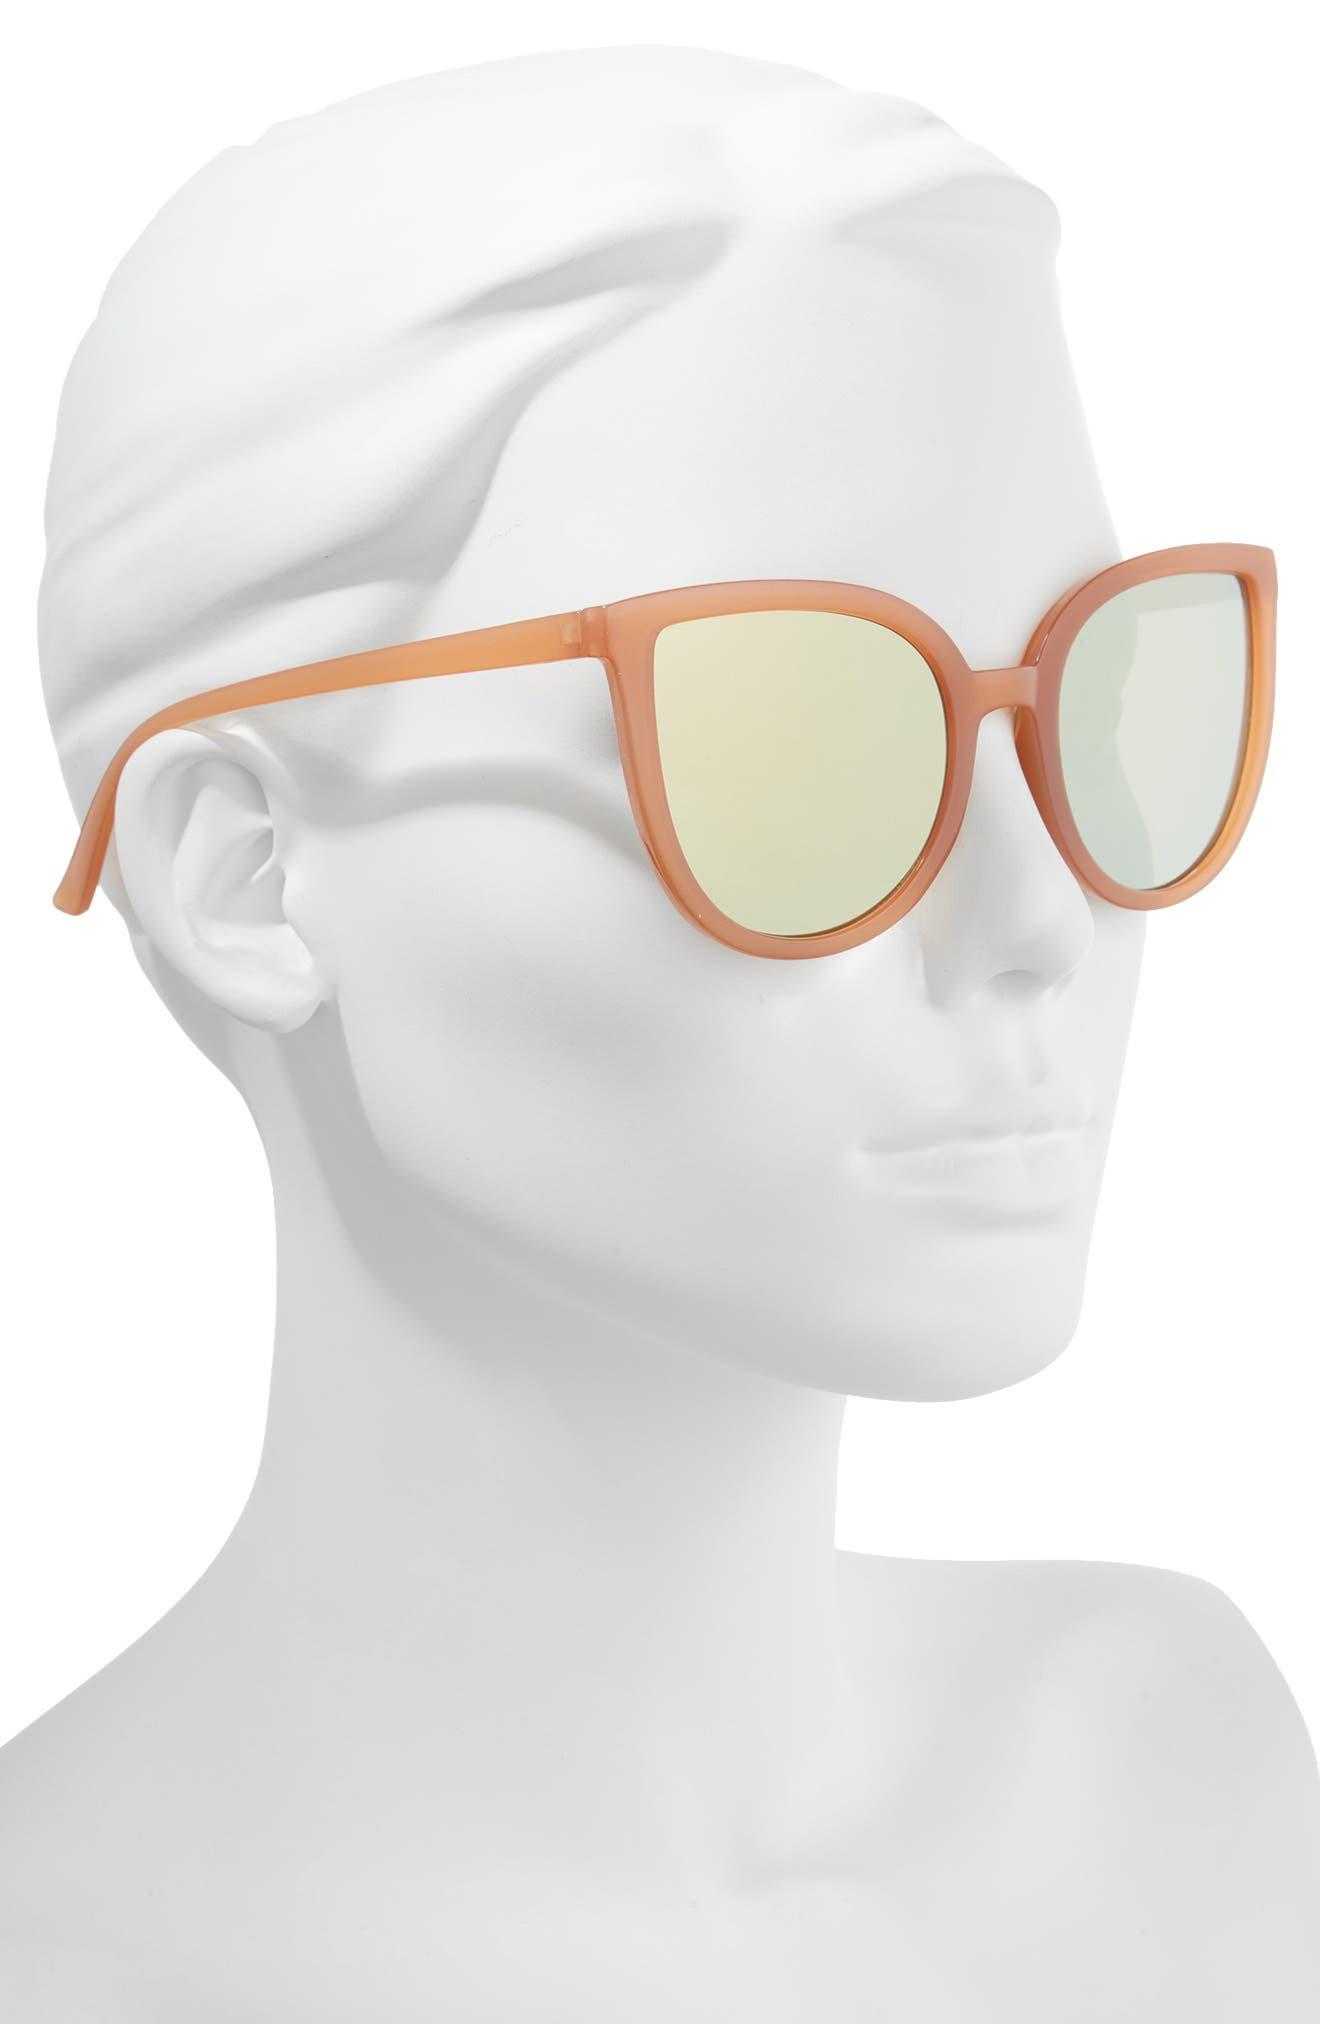 Thin Cat Eye Sunglasses,                             Alternate thumbnail 2, color,                             Milky Peach/ Gold